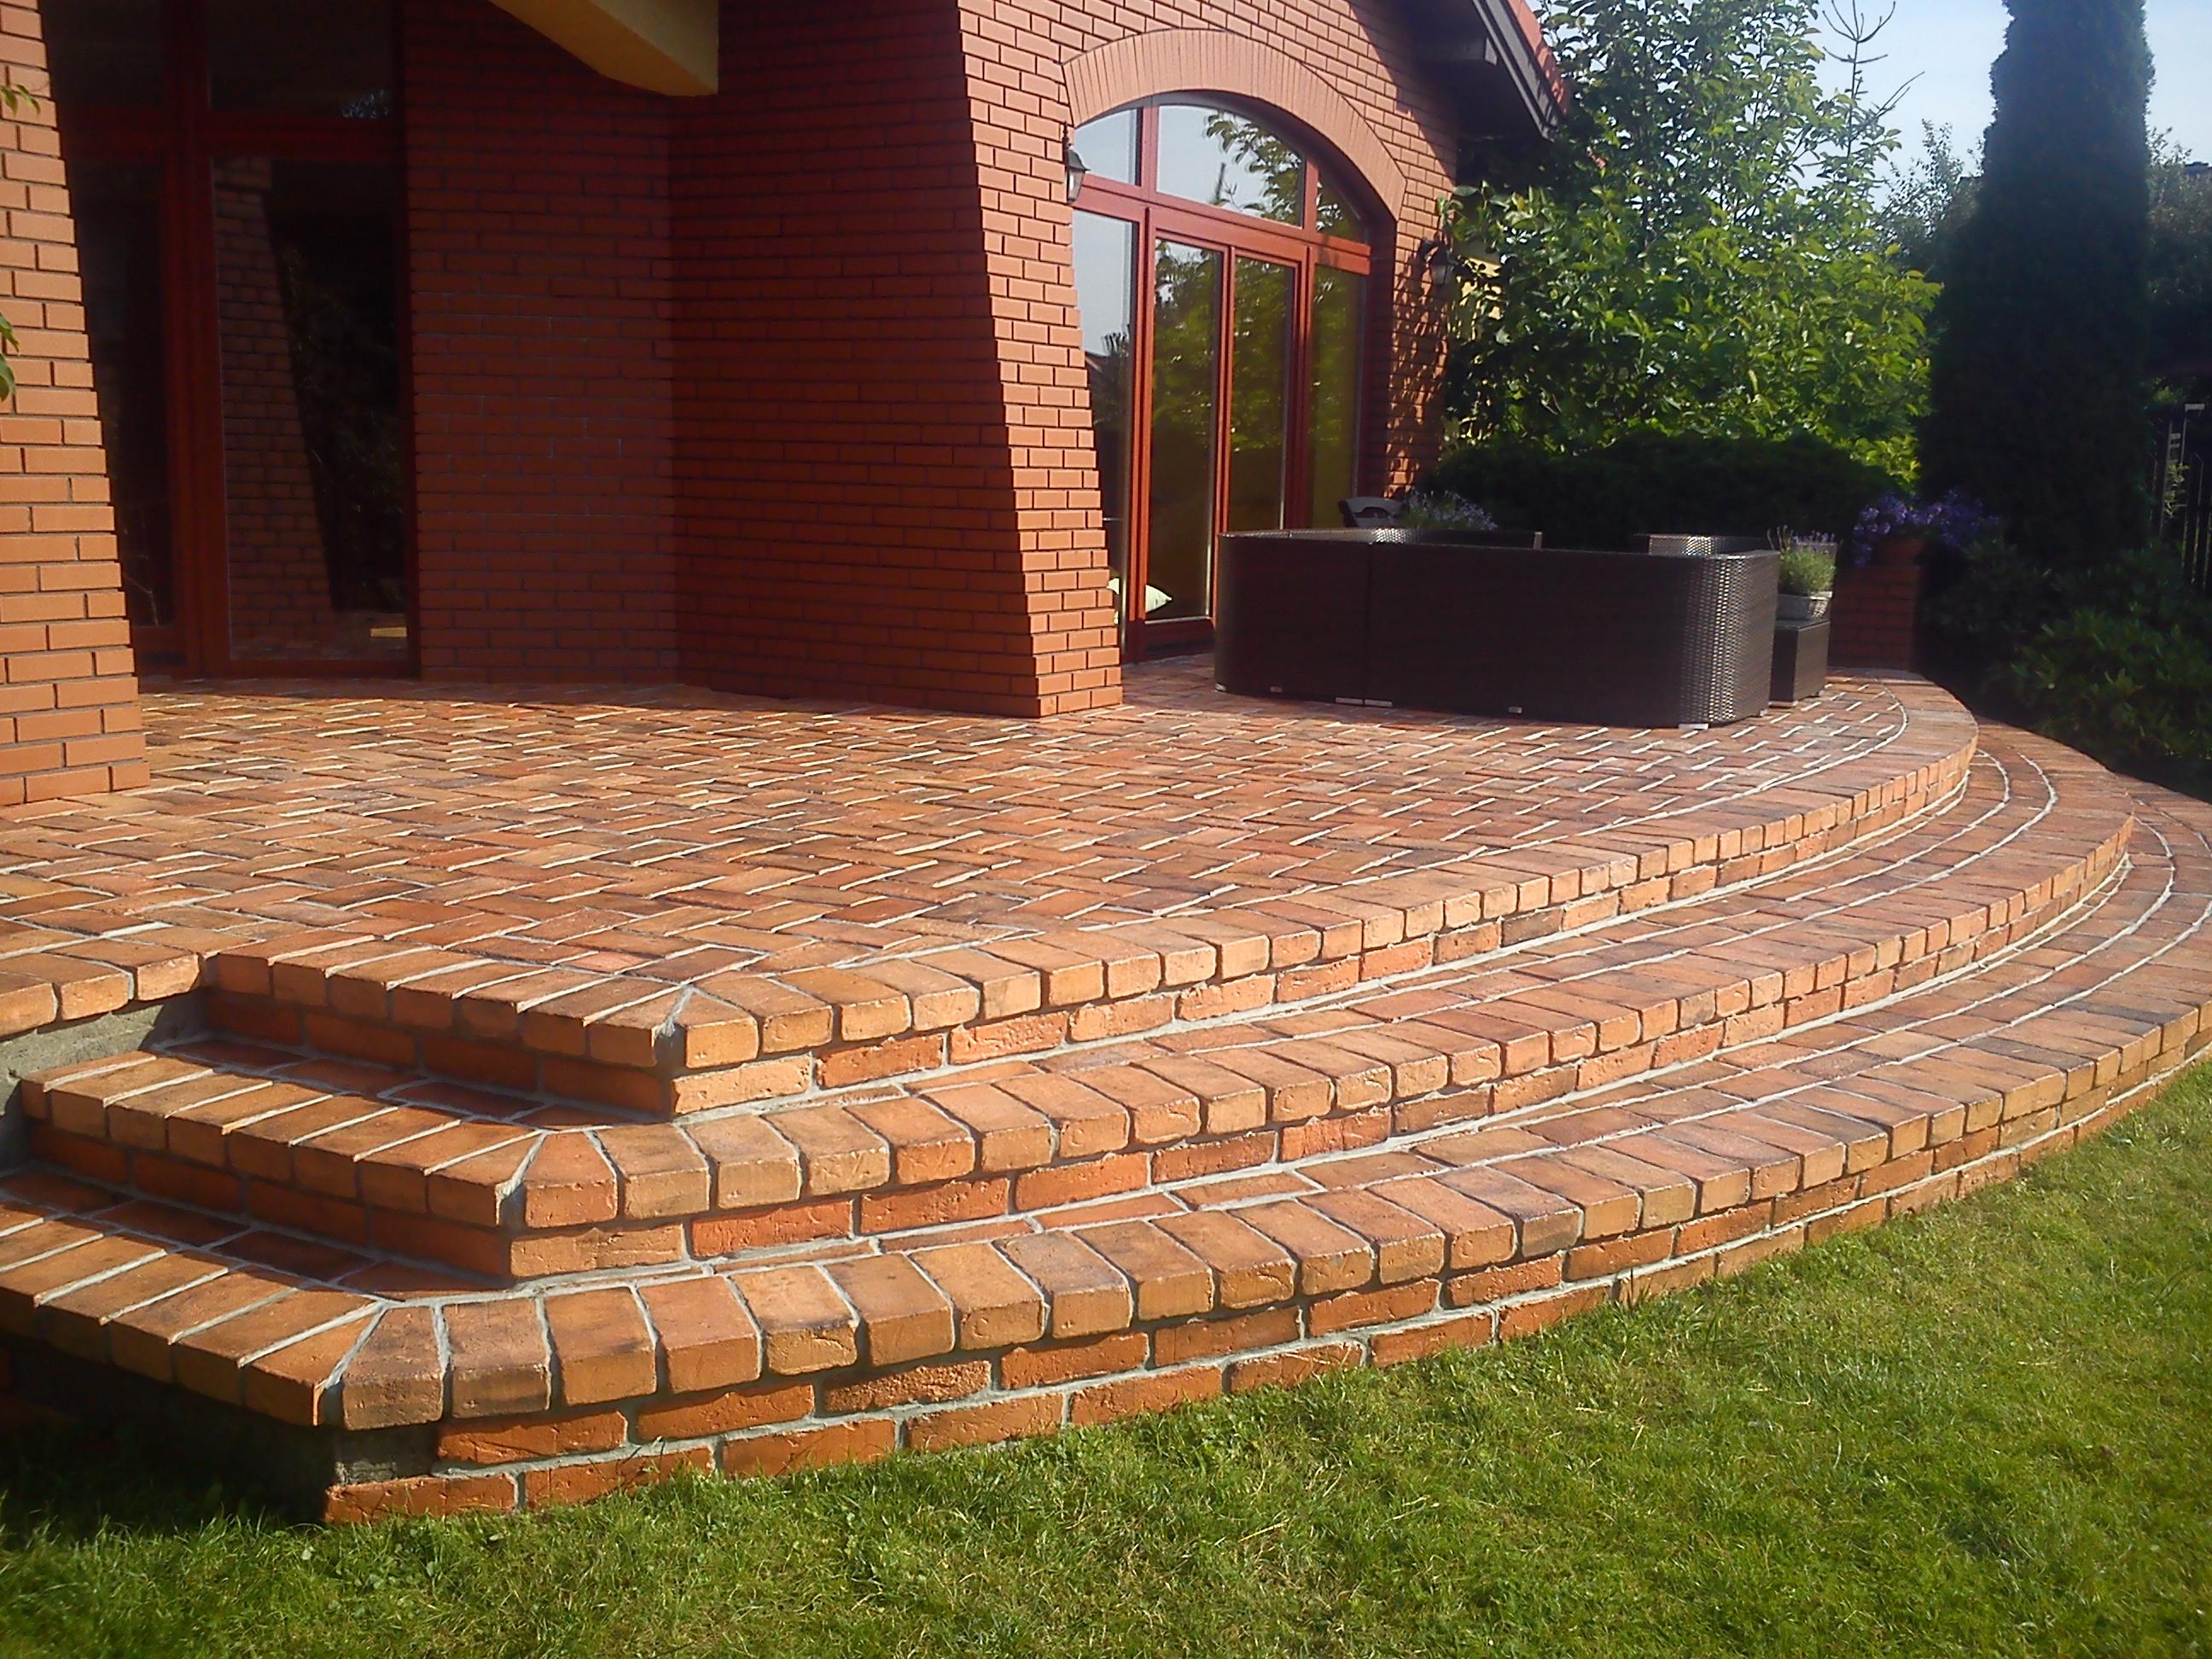 Brick tiles on terraces elkamino dom brick tiles on terraces 11 dailygadgetfo Images